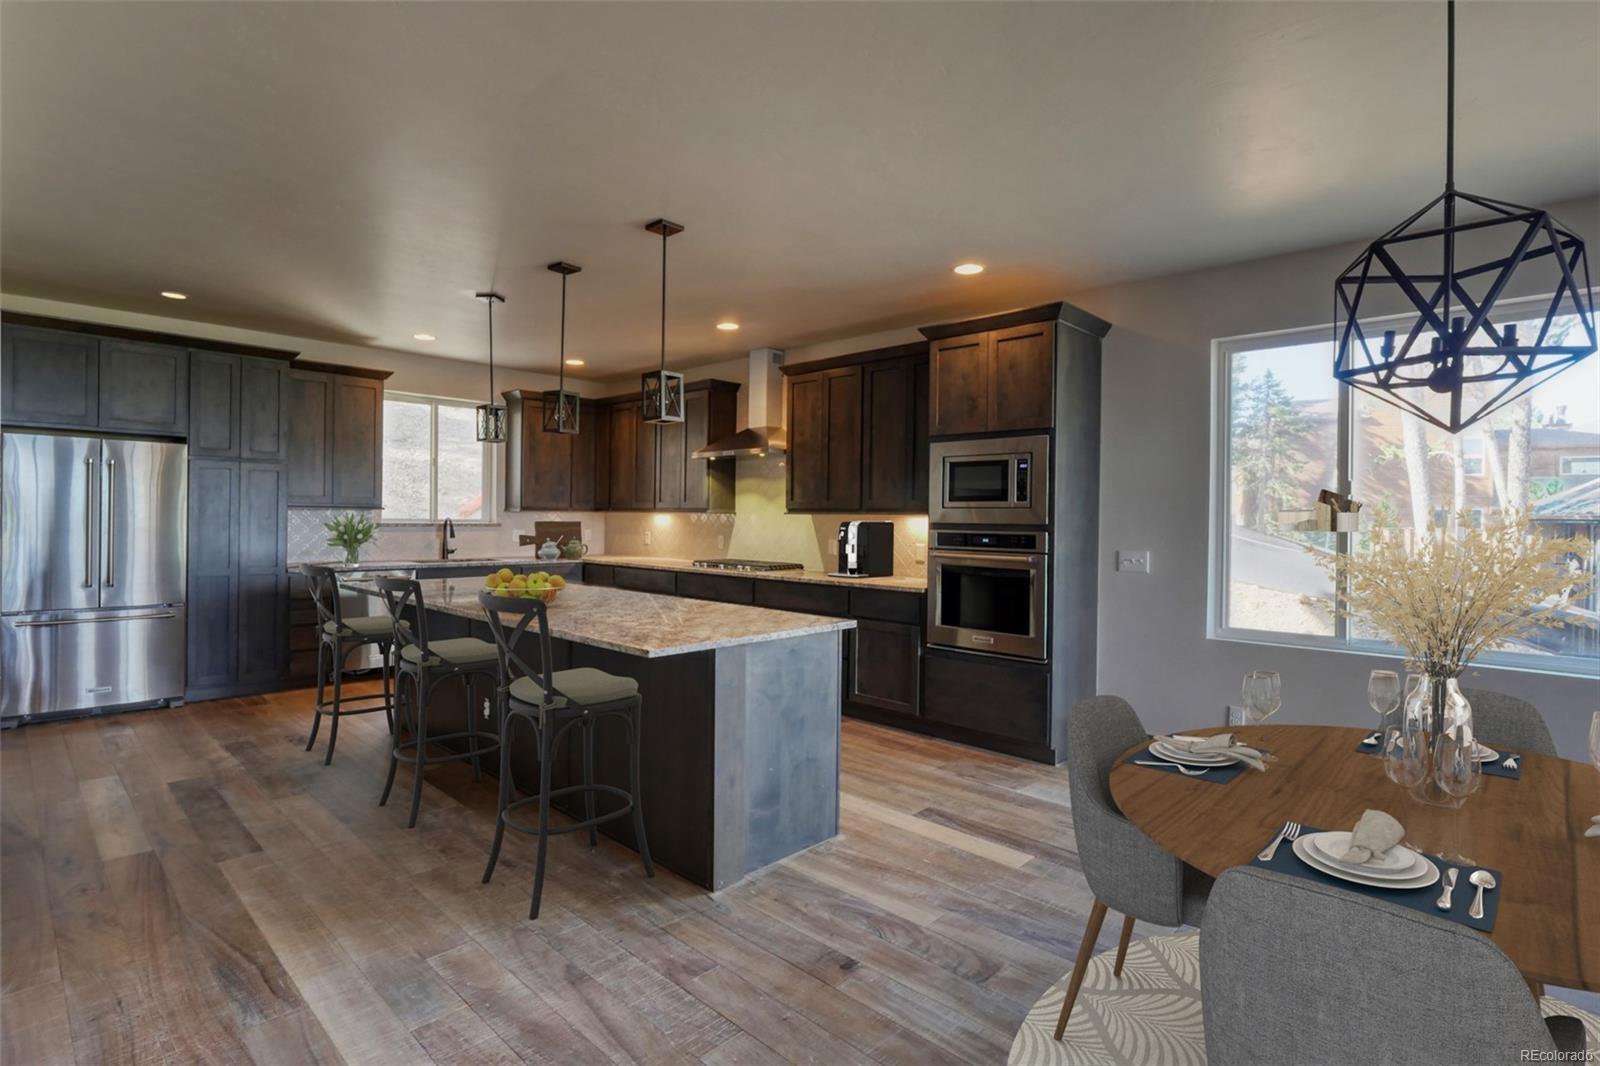 MLS# 9872227 - 4 - 264 N Fuller Placer Drive, , Breckenridge, CO 80424